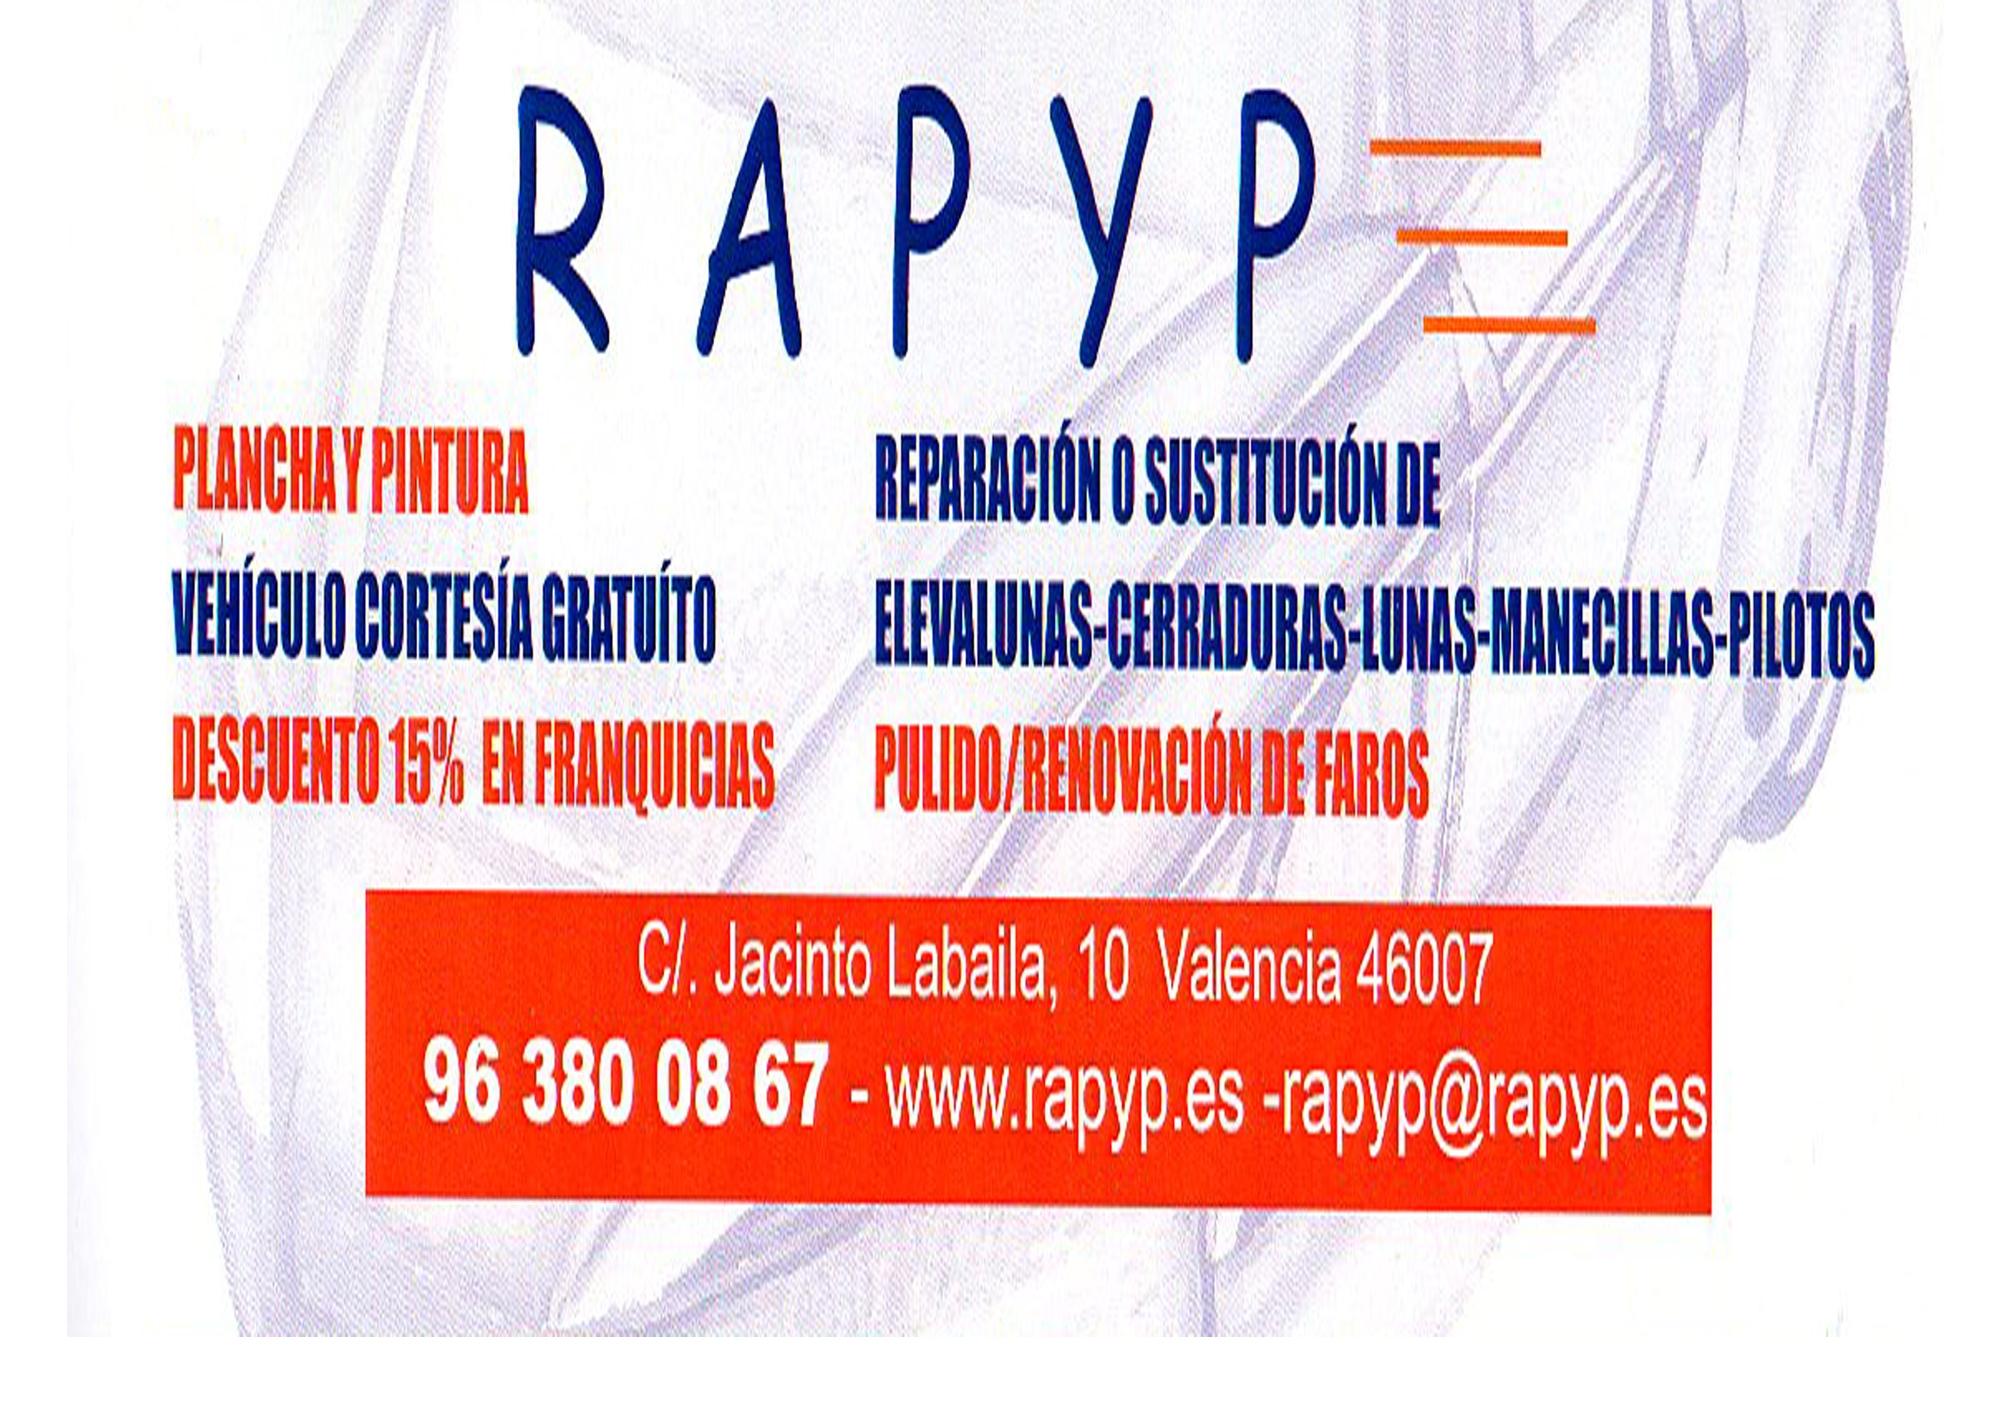 Rapyp